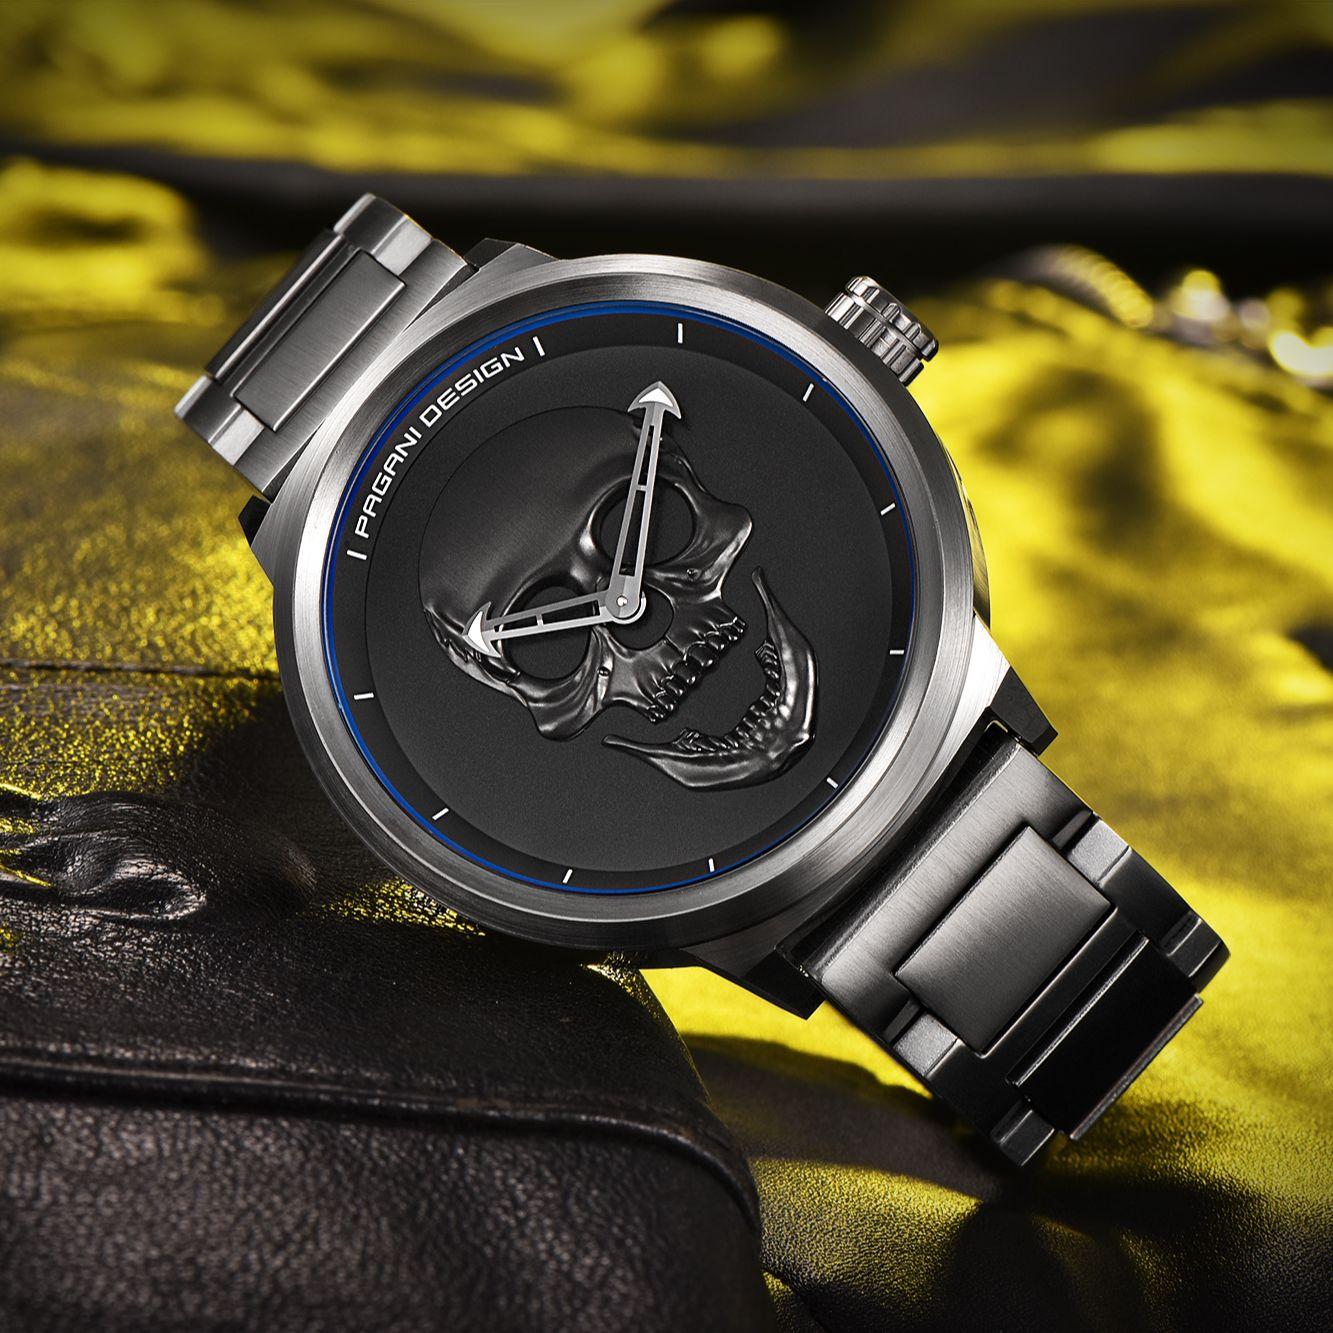 2021 New Pagani Design Military Watch Men's Luxury Quartz Watch Stainless Steel Automatic Waterproof Clock Men Personality Watch enlarge